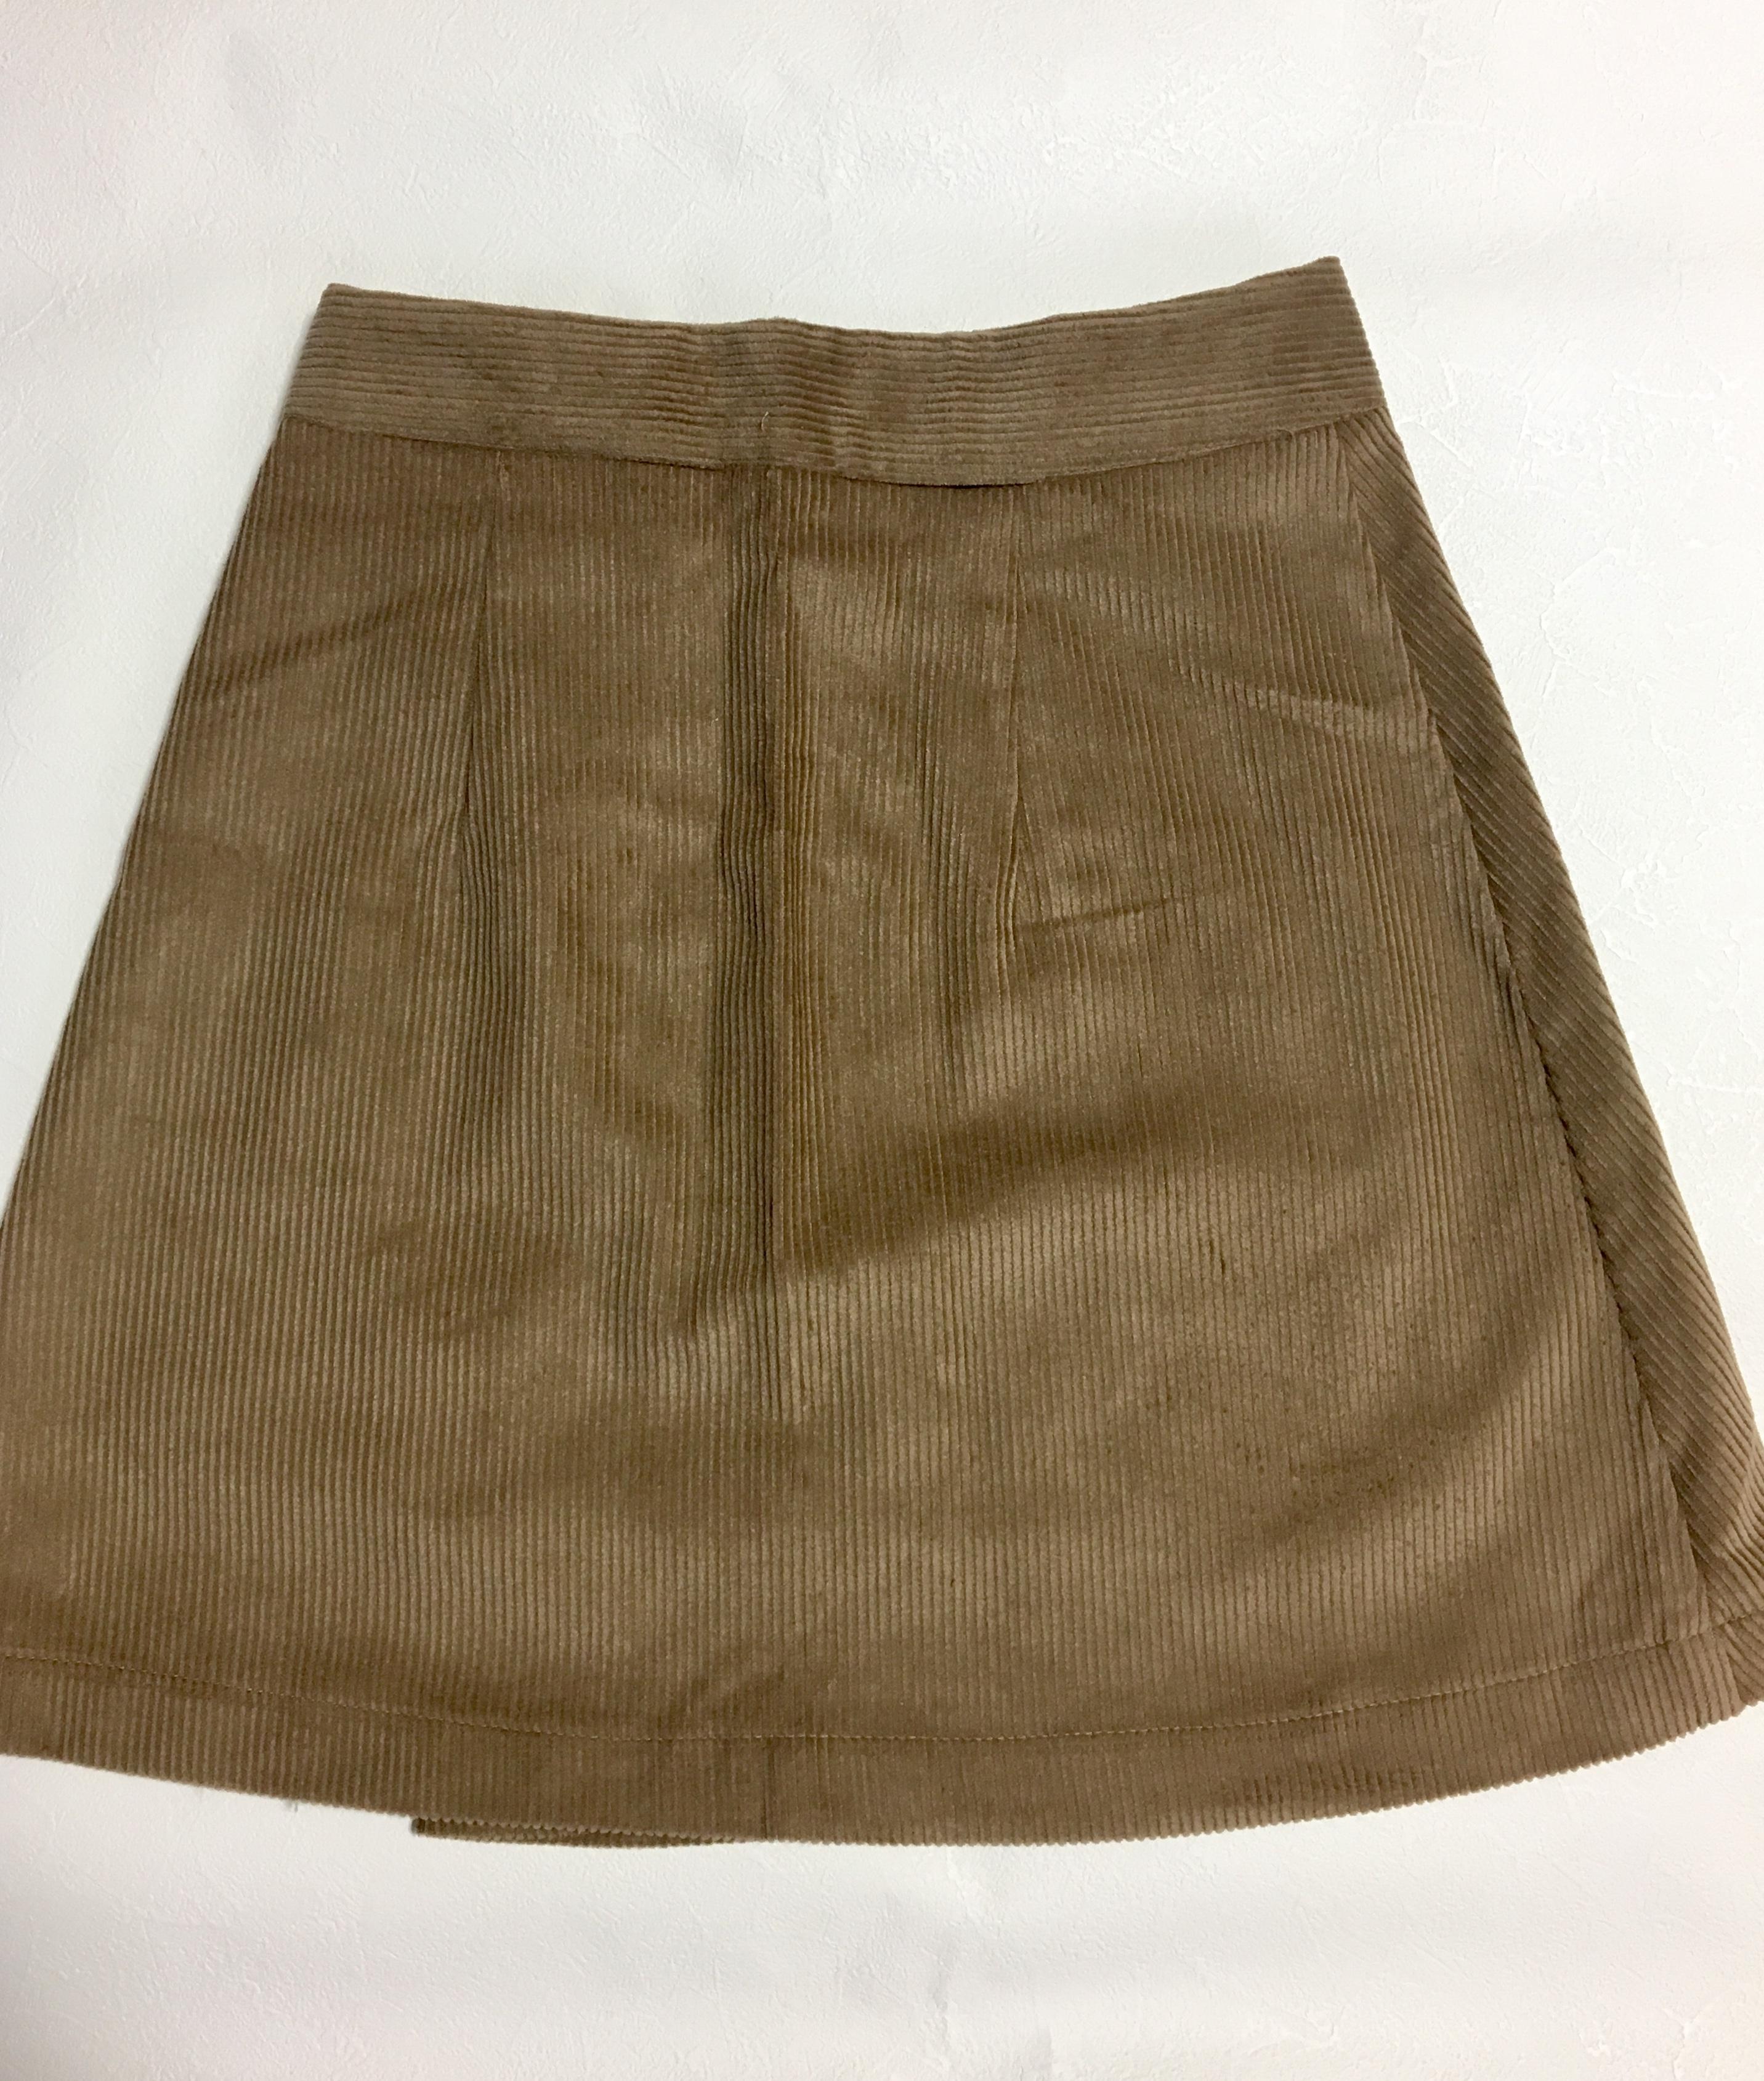 Corduroy wrap skirt